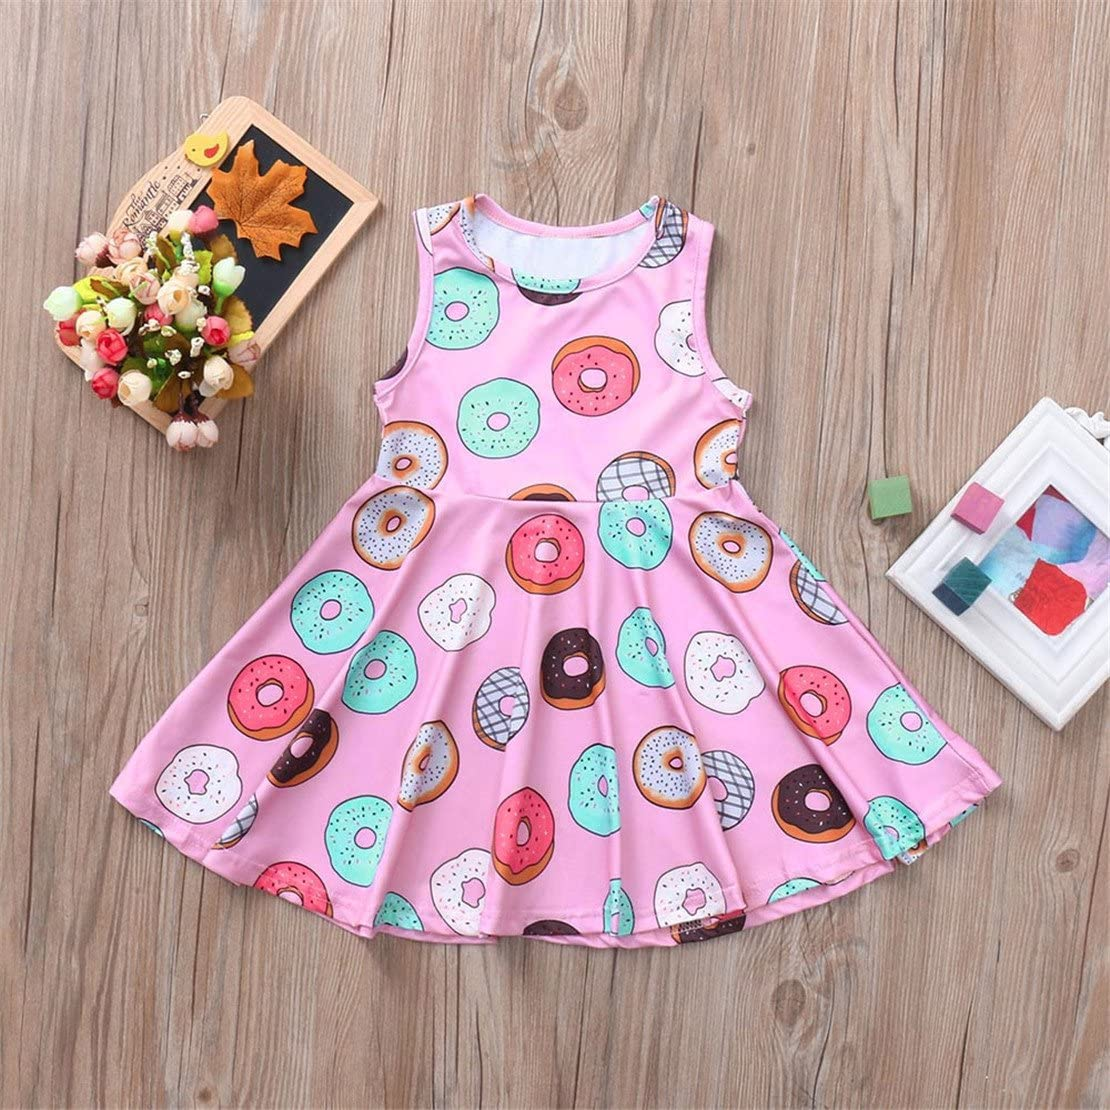 ZHANGVIP Toddler Kids Baby Girls Doughnut Printed Dress Cartoon Pattern Sleeveless Princess Dress Clothes Outfits Skirt